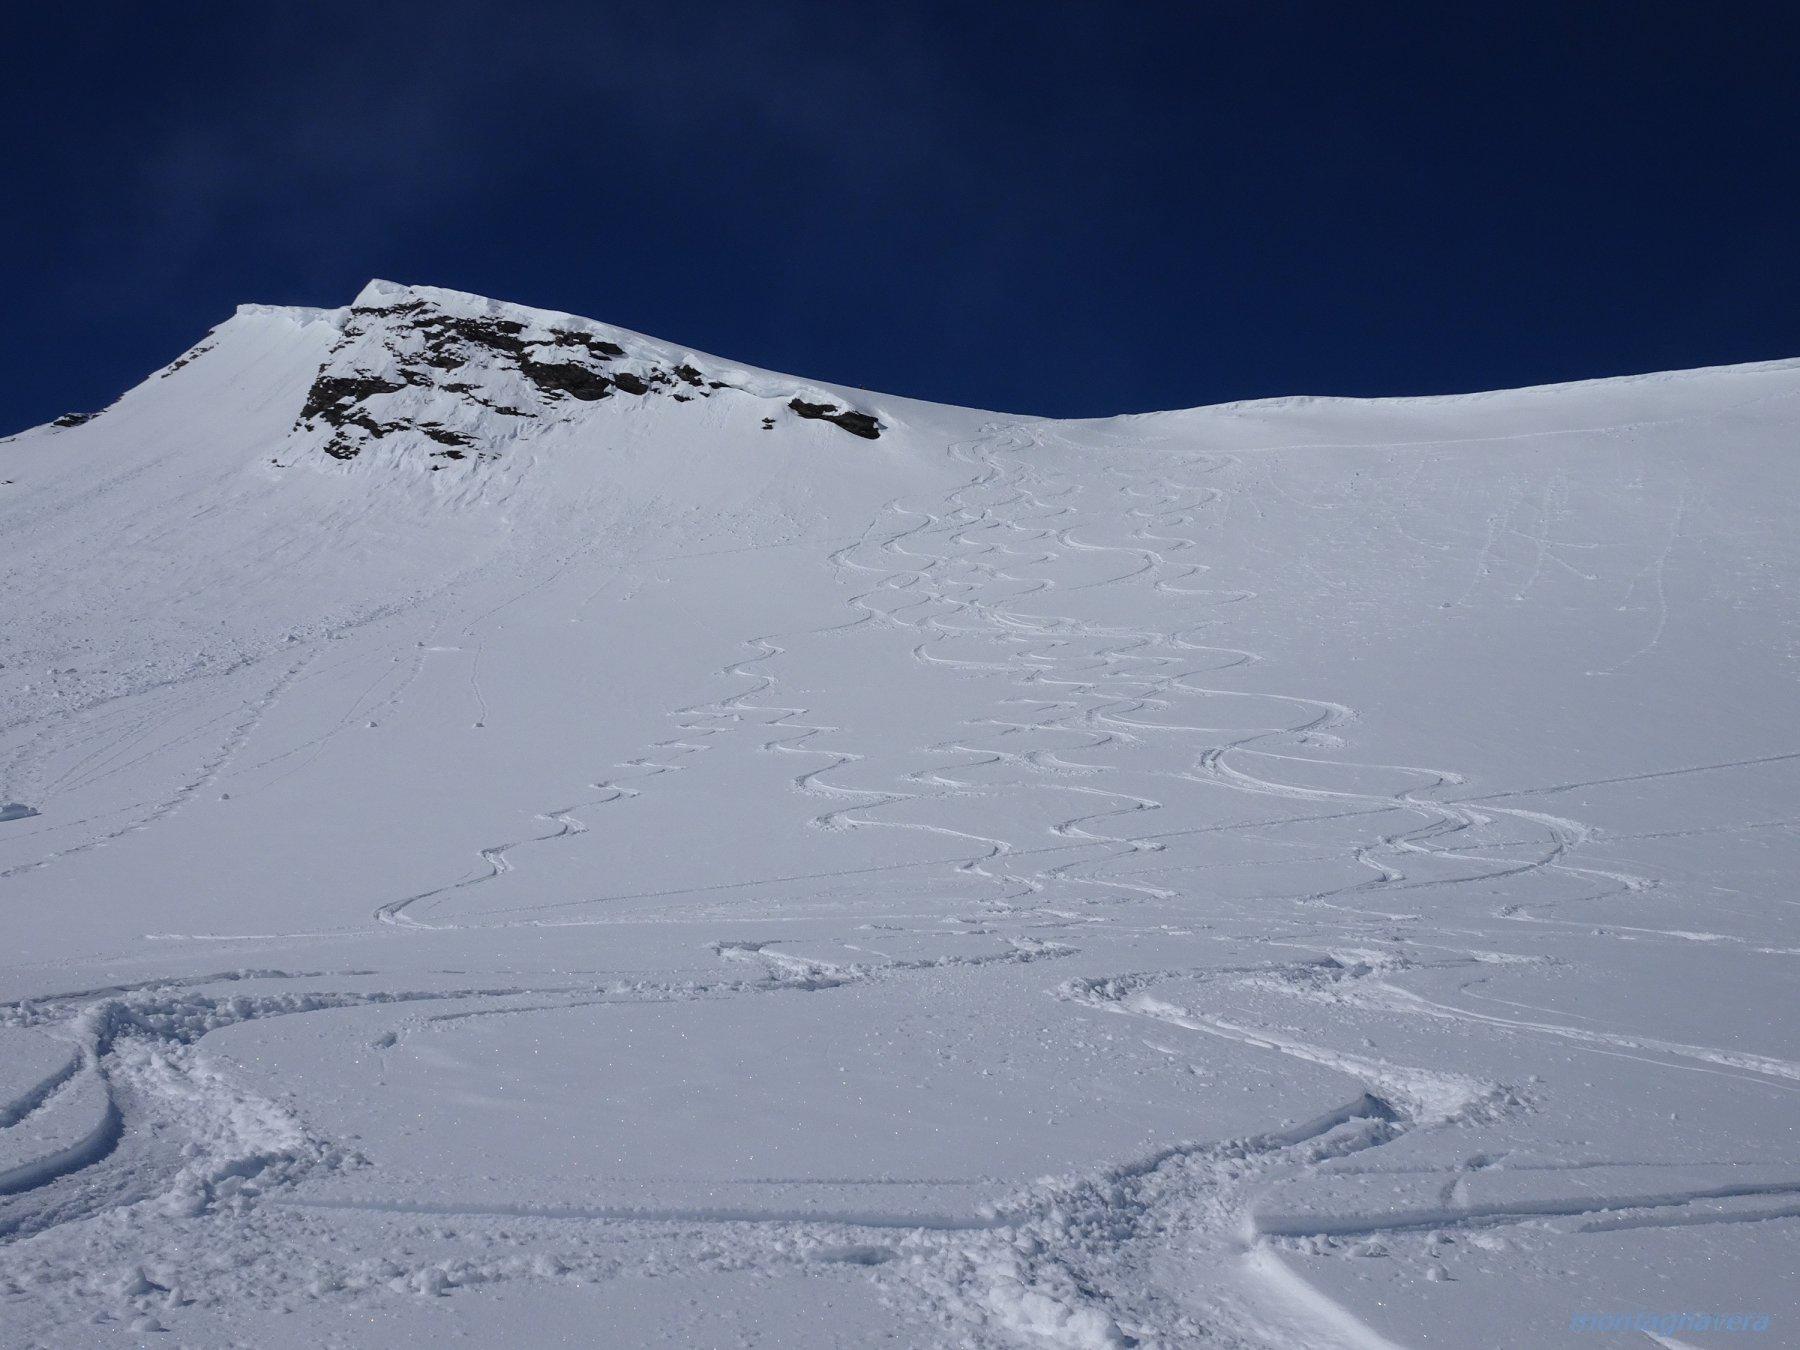 serpentine parte alta 2900-2400m